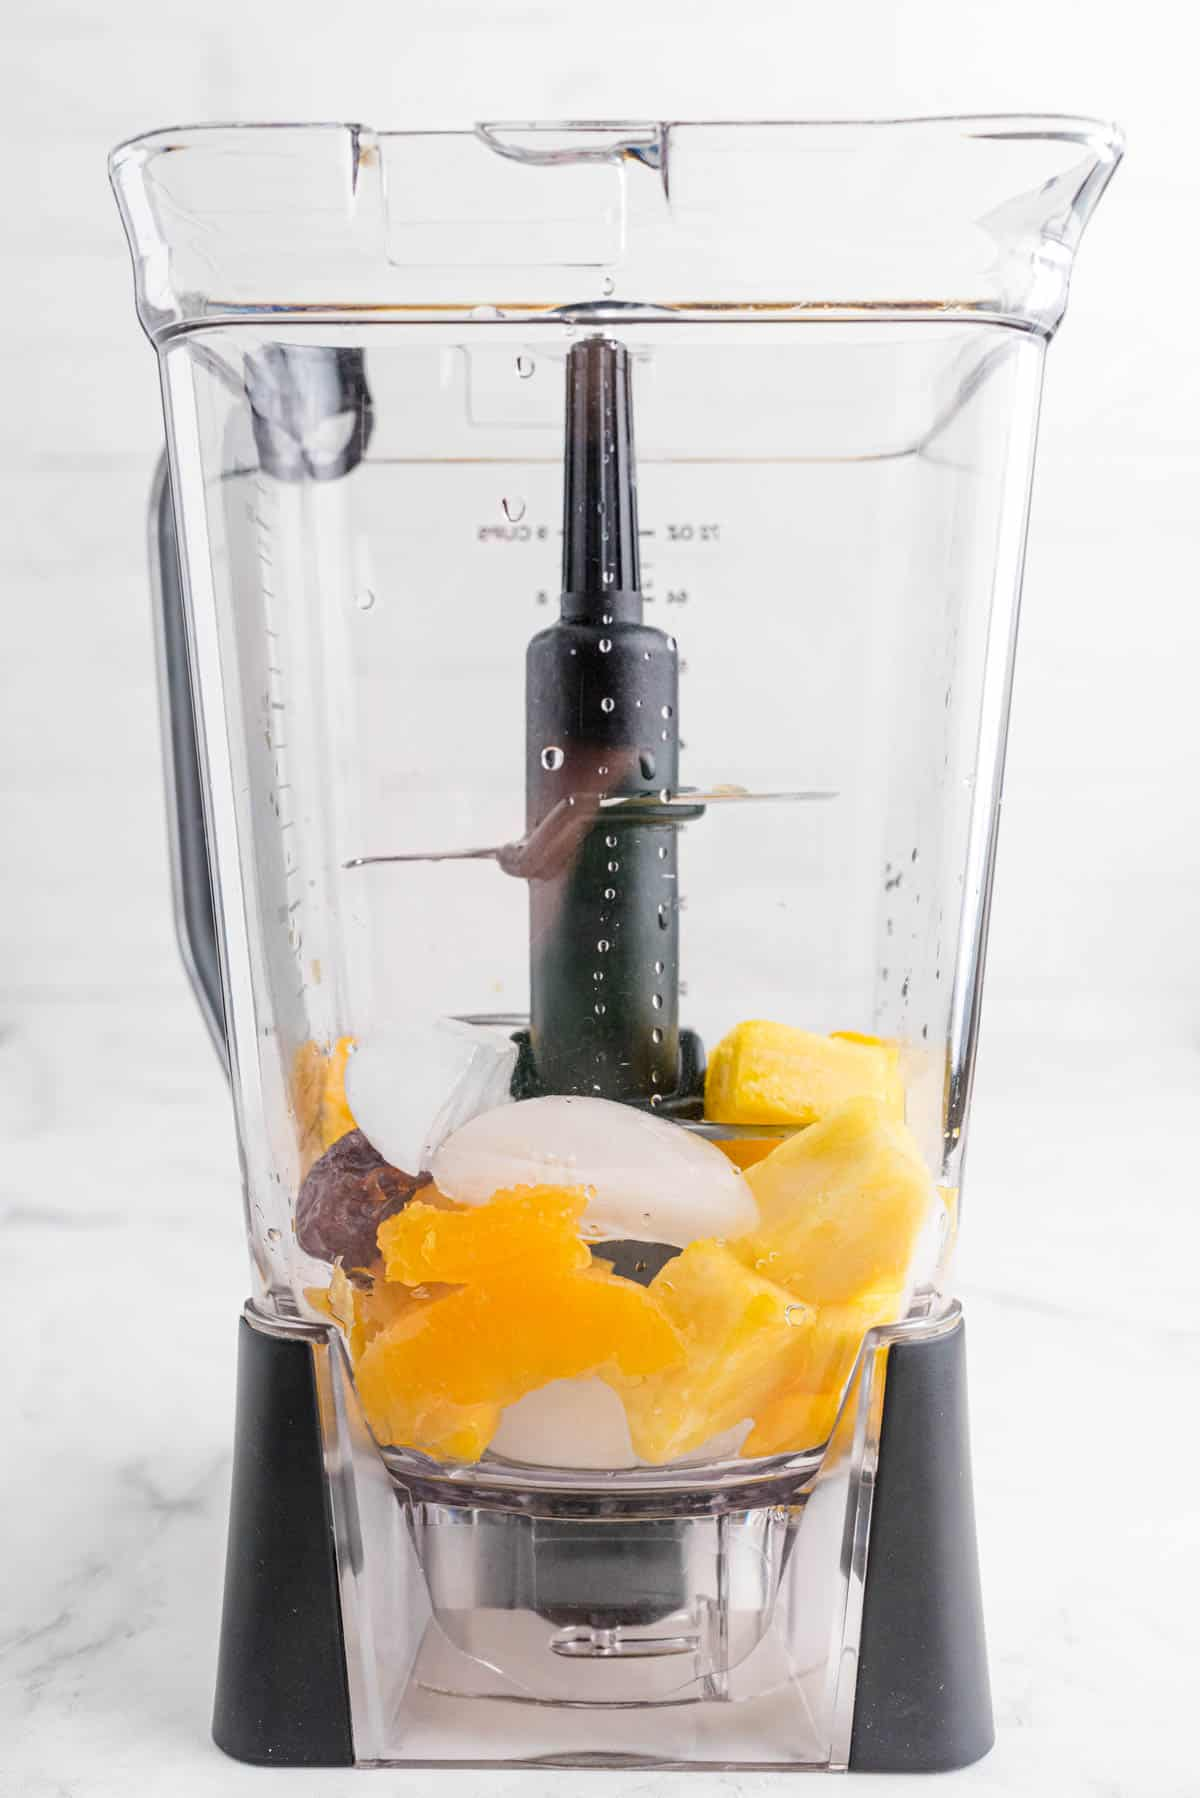 ingredients for citrus smoothie in a blender